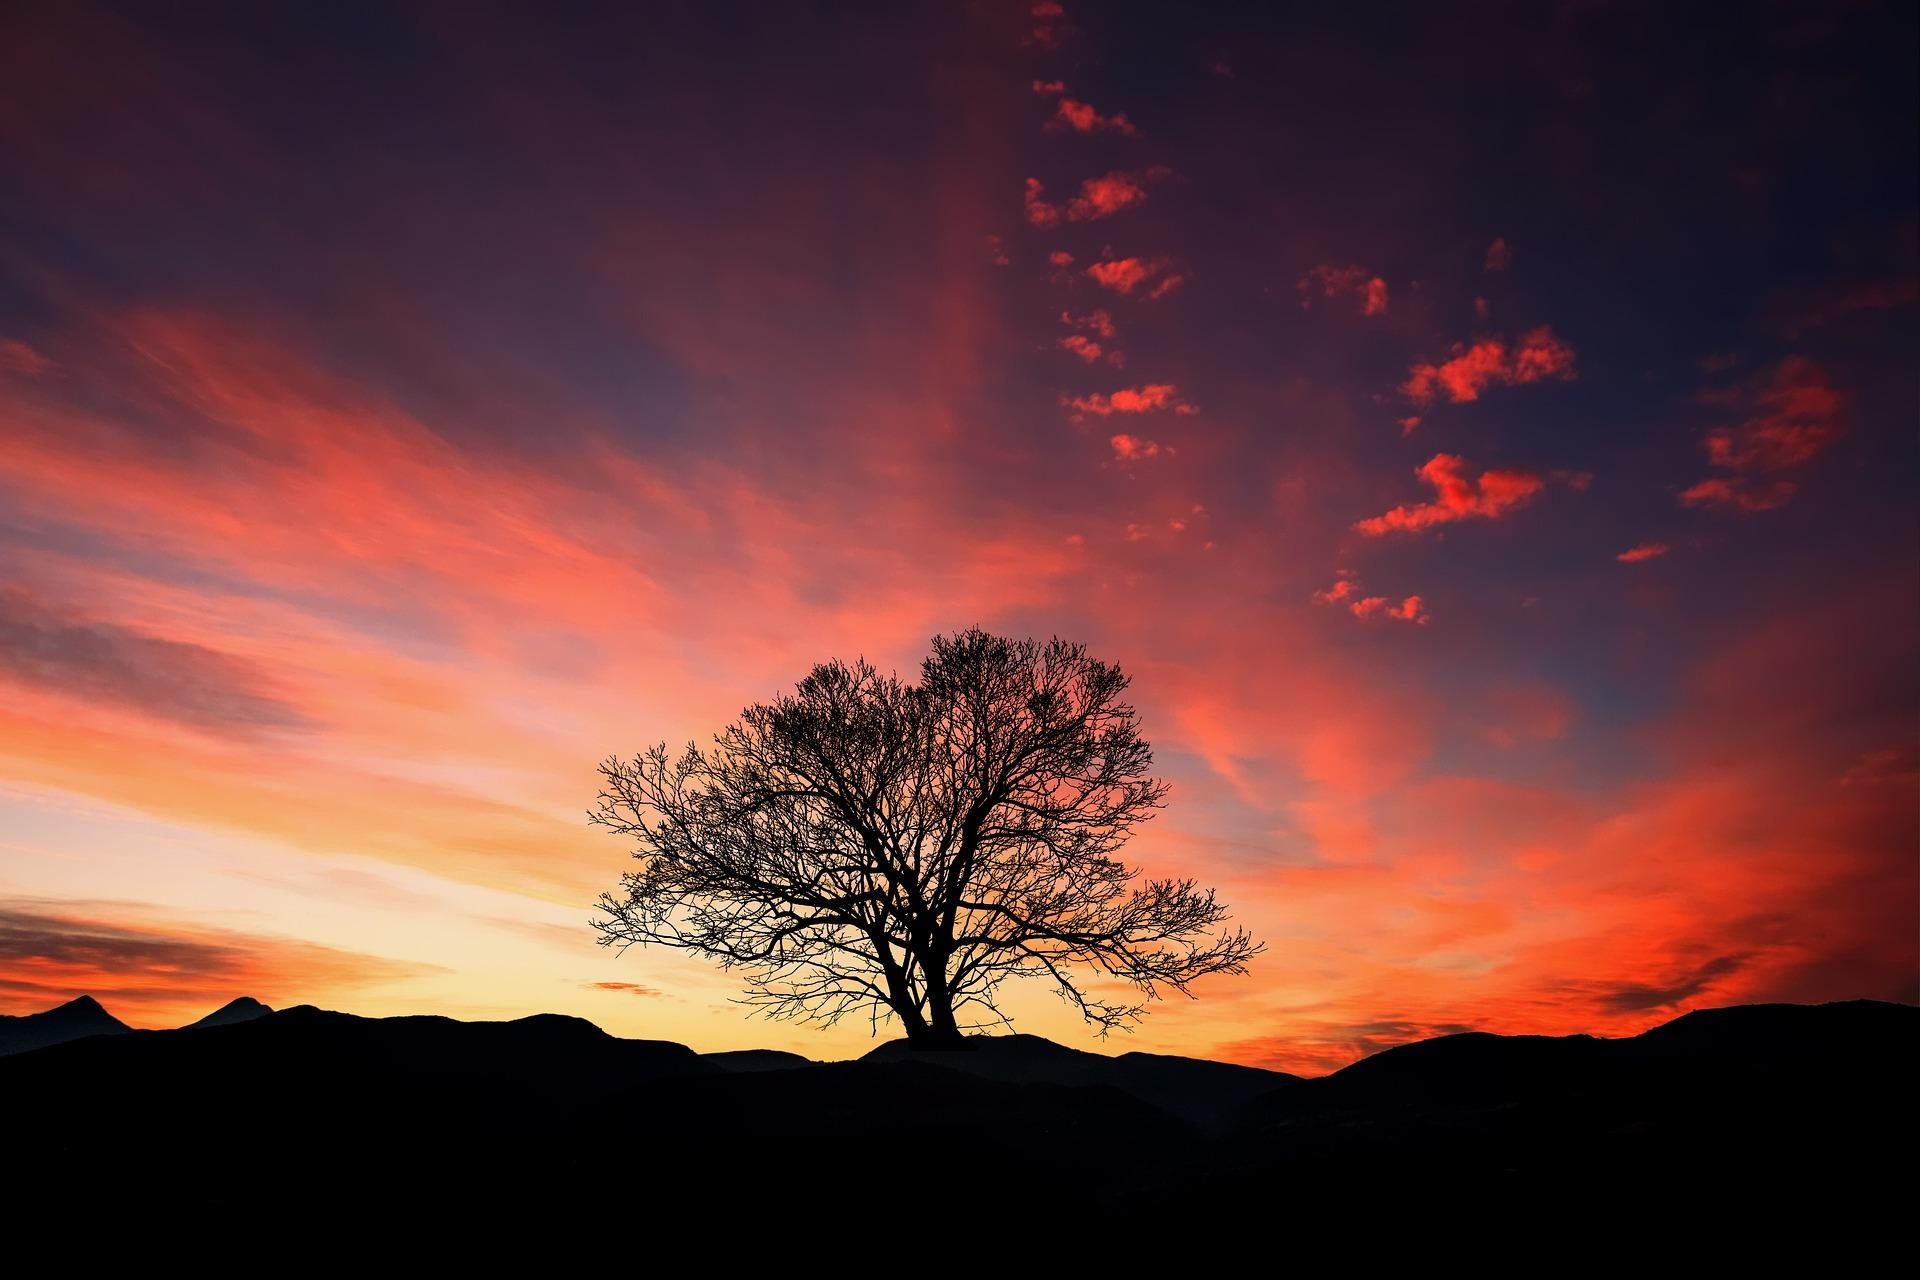 sunset-3047544_1920.jpg